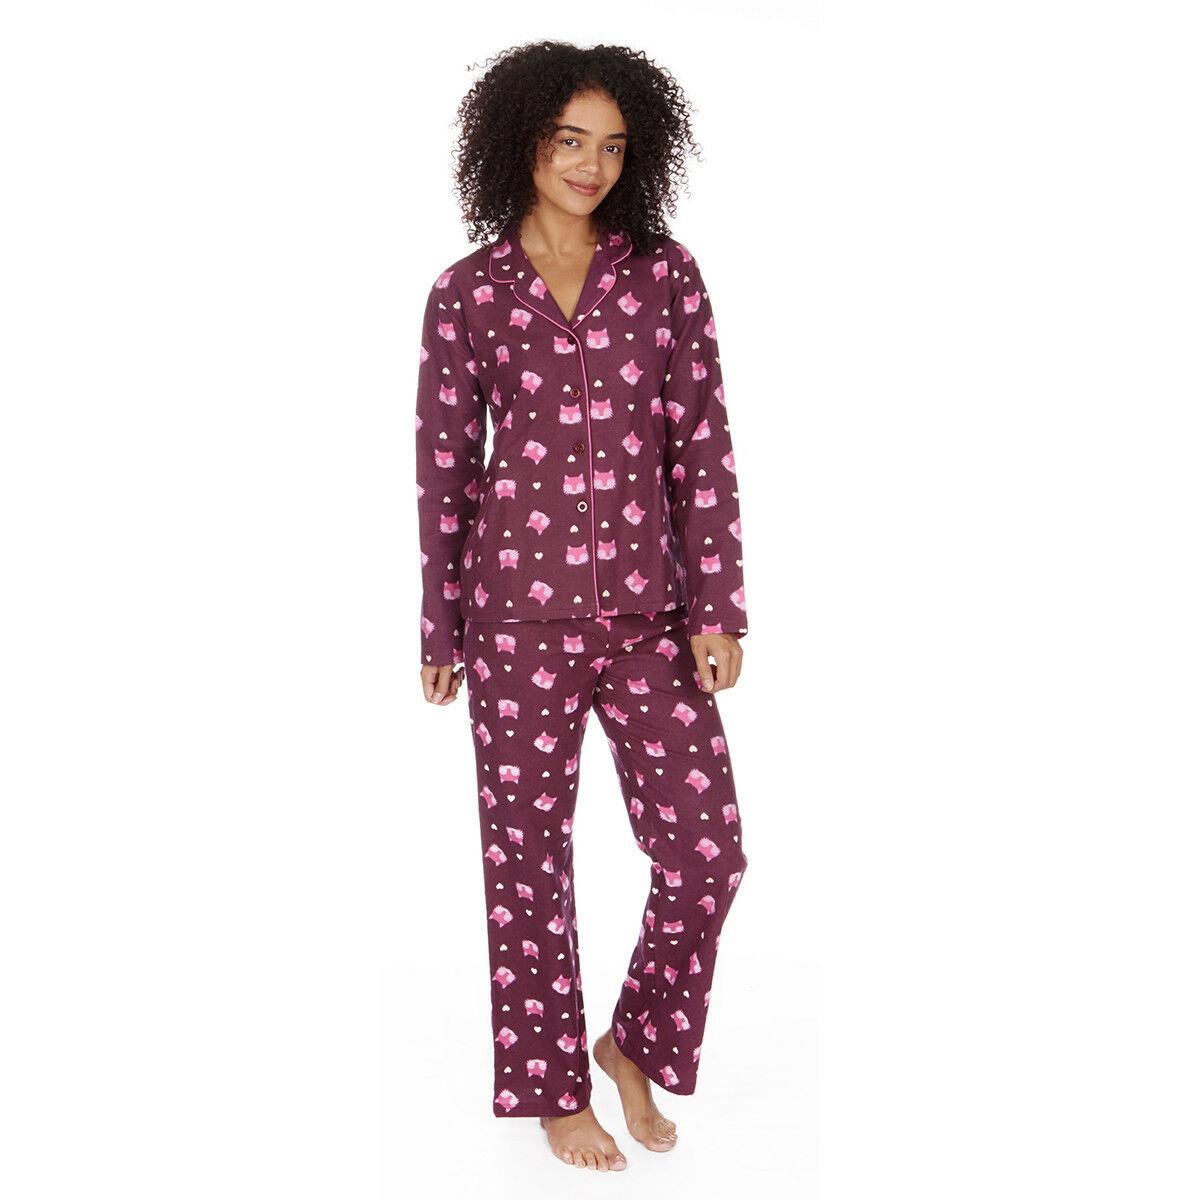 Women/'s Ladies Cotton Flannel Pyjama PJ Set Buttoned Night Owl Sleepwear New UK